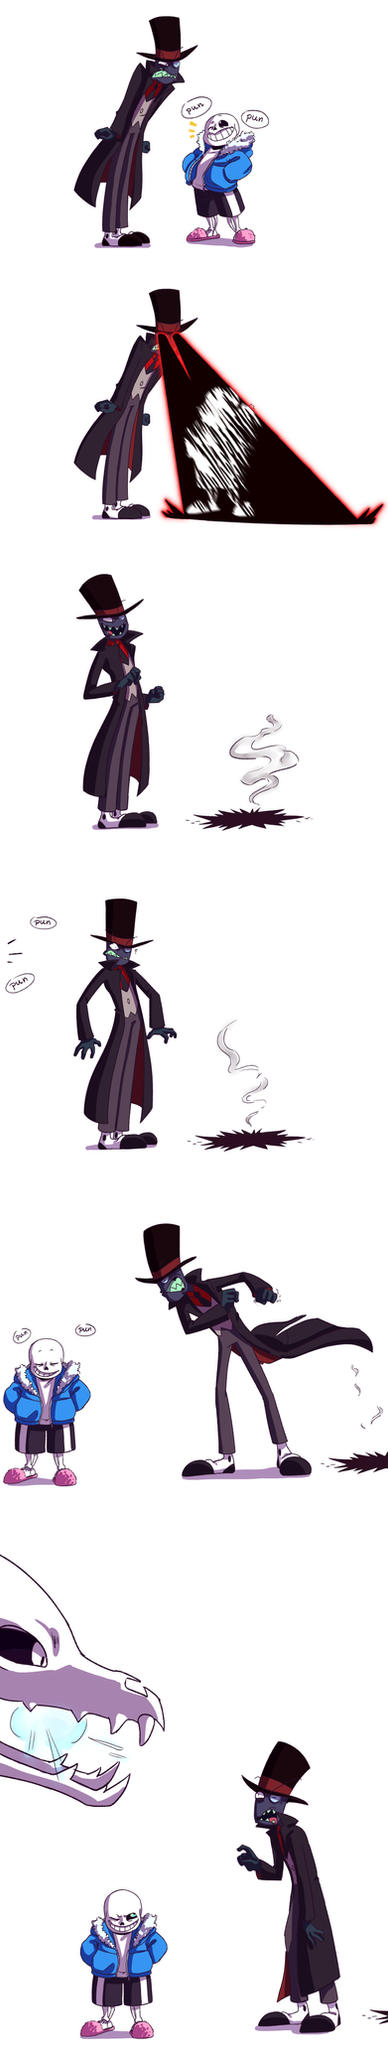 Sans meets Black Hat by paurachan